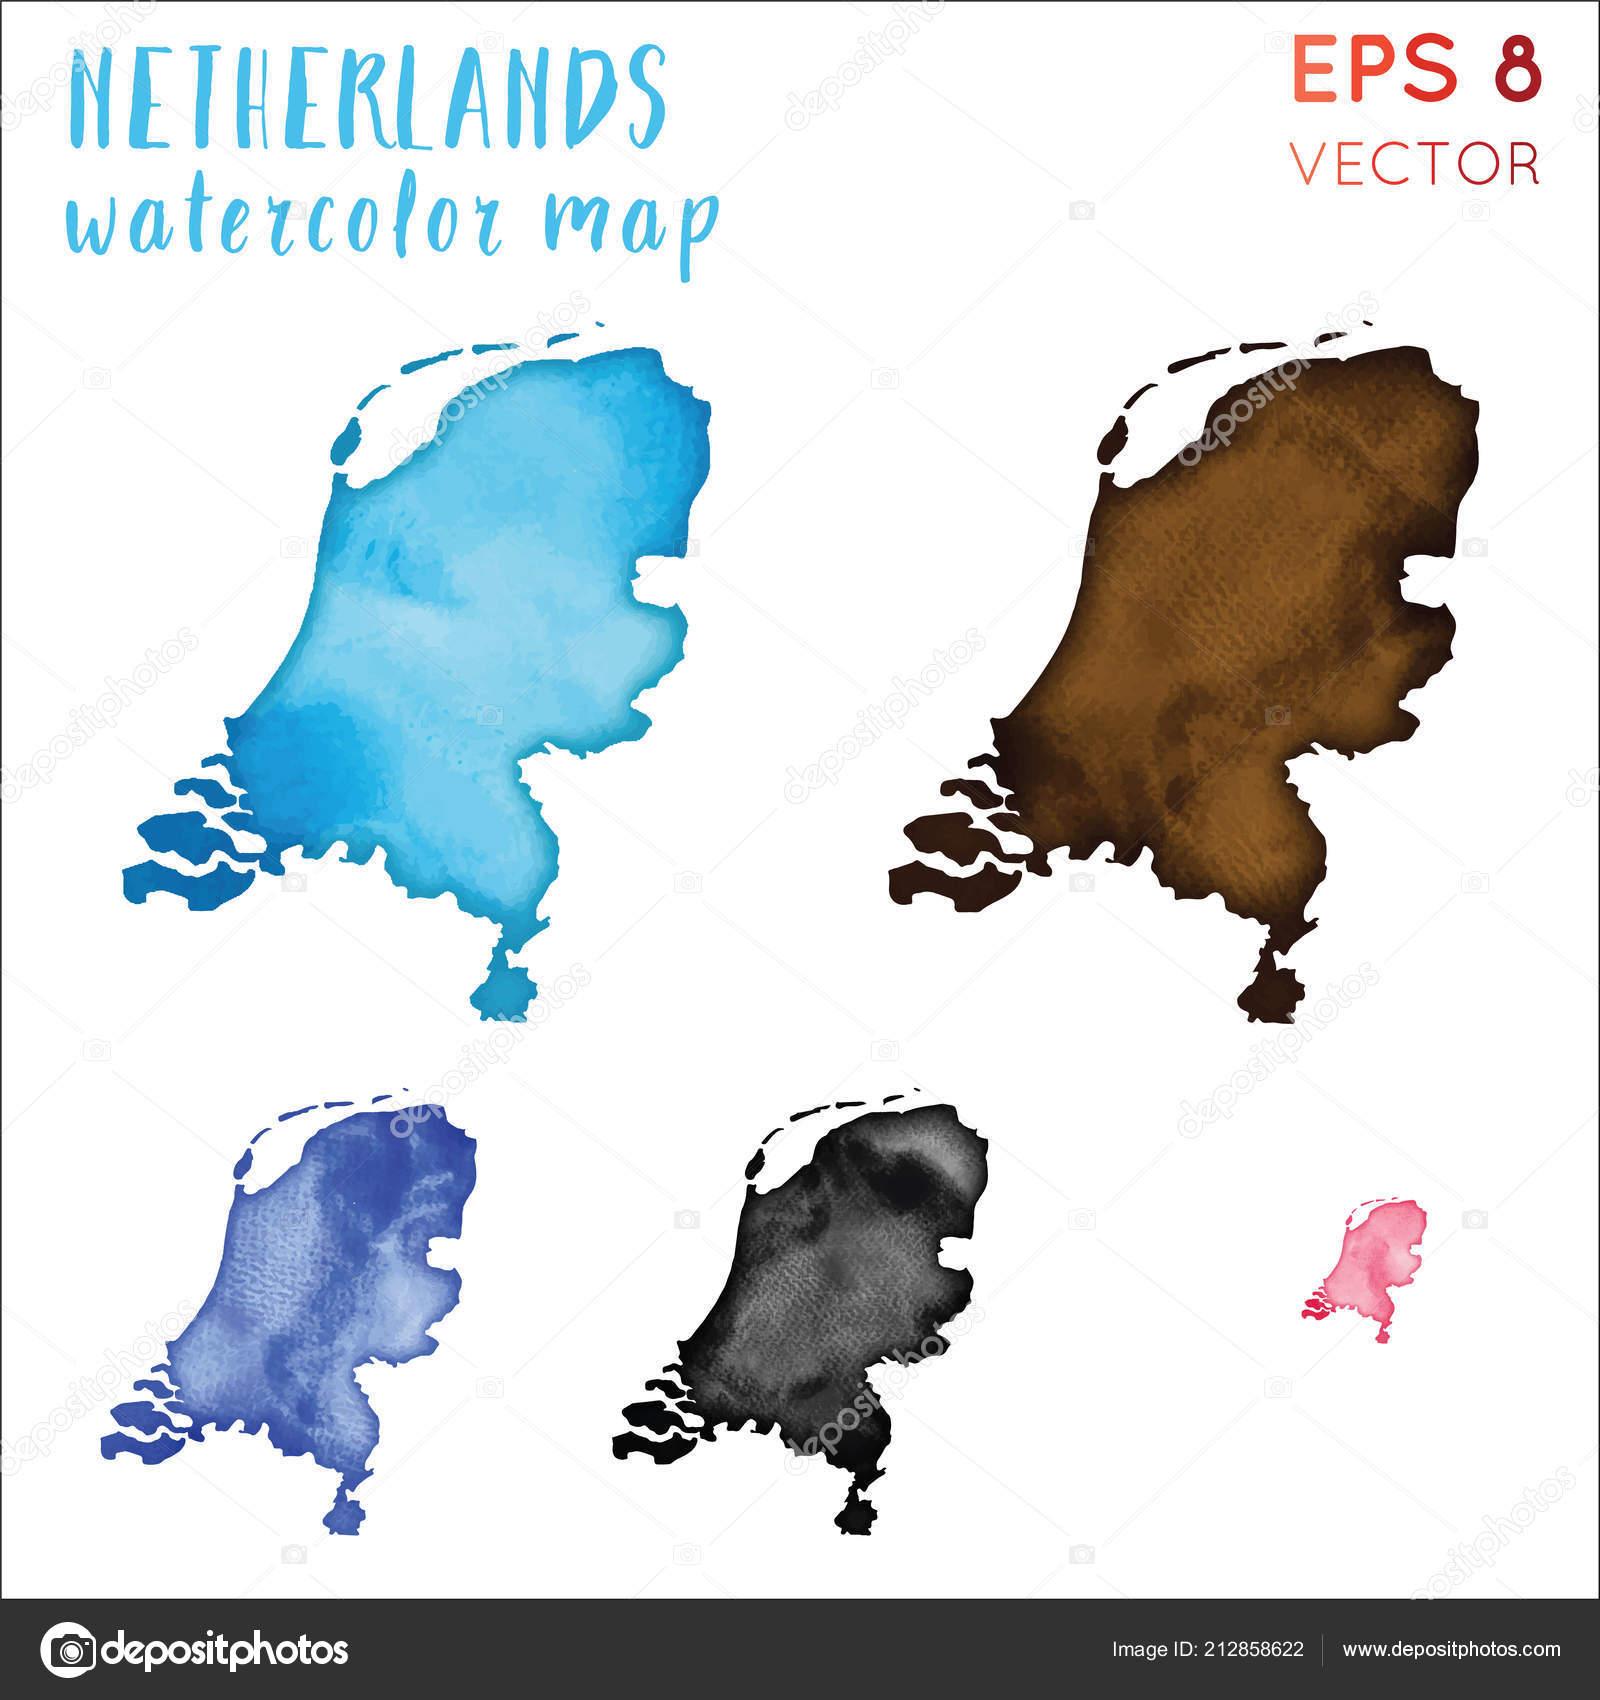 Niederlande Karte Umriss.Niederlande Aquarell Landkarte Handbemalt Aquarell Niederlande Karte